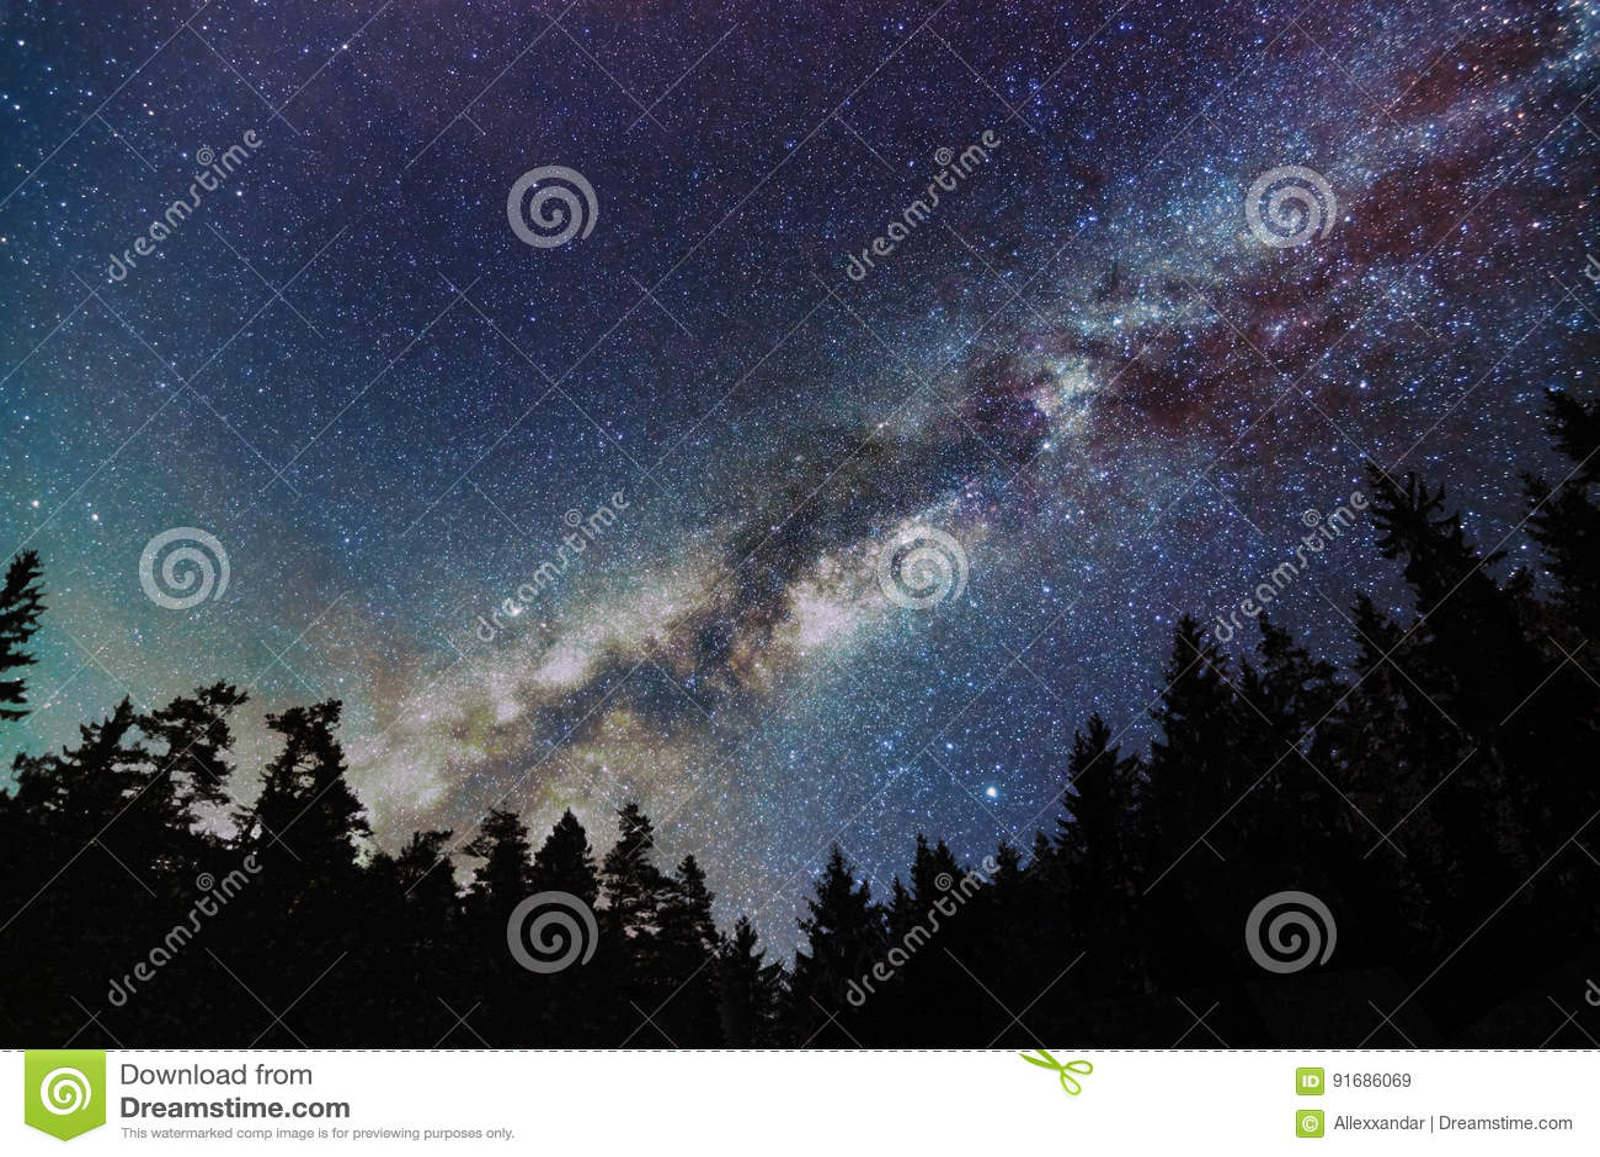 Milky Way Galaxy, Starry sky with trees. Starry night.